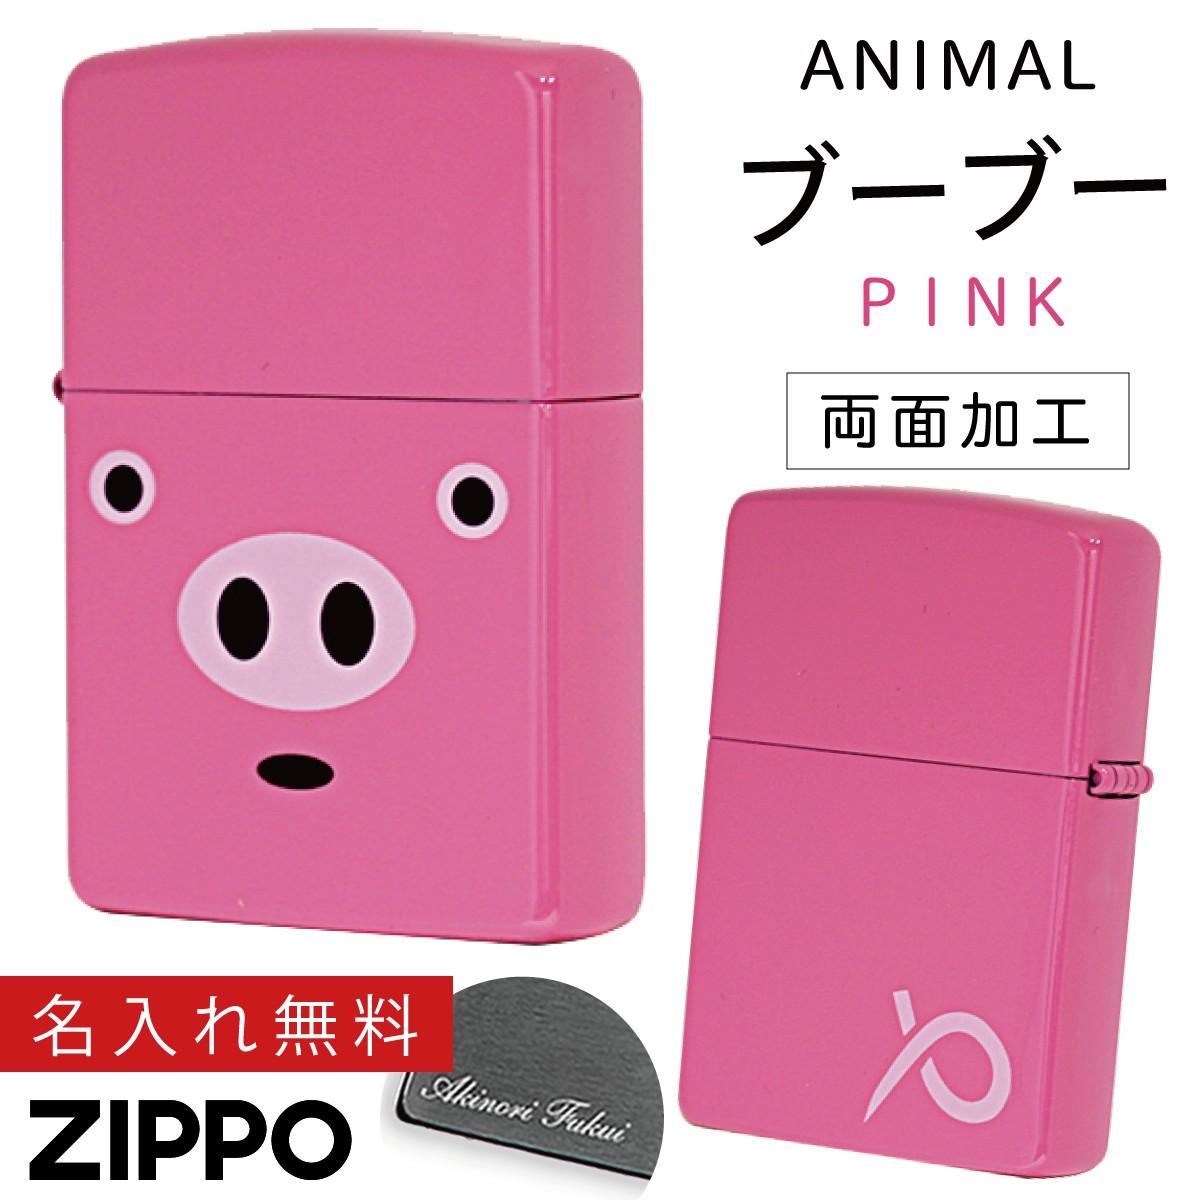 lighterya name correspondence put zippo zippo zippo lighter lighter